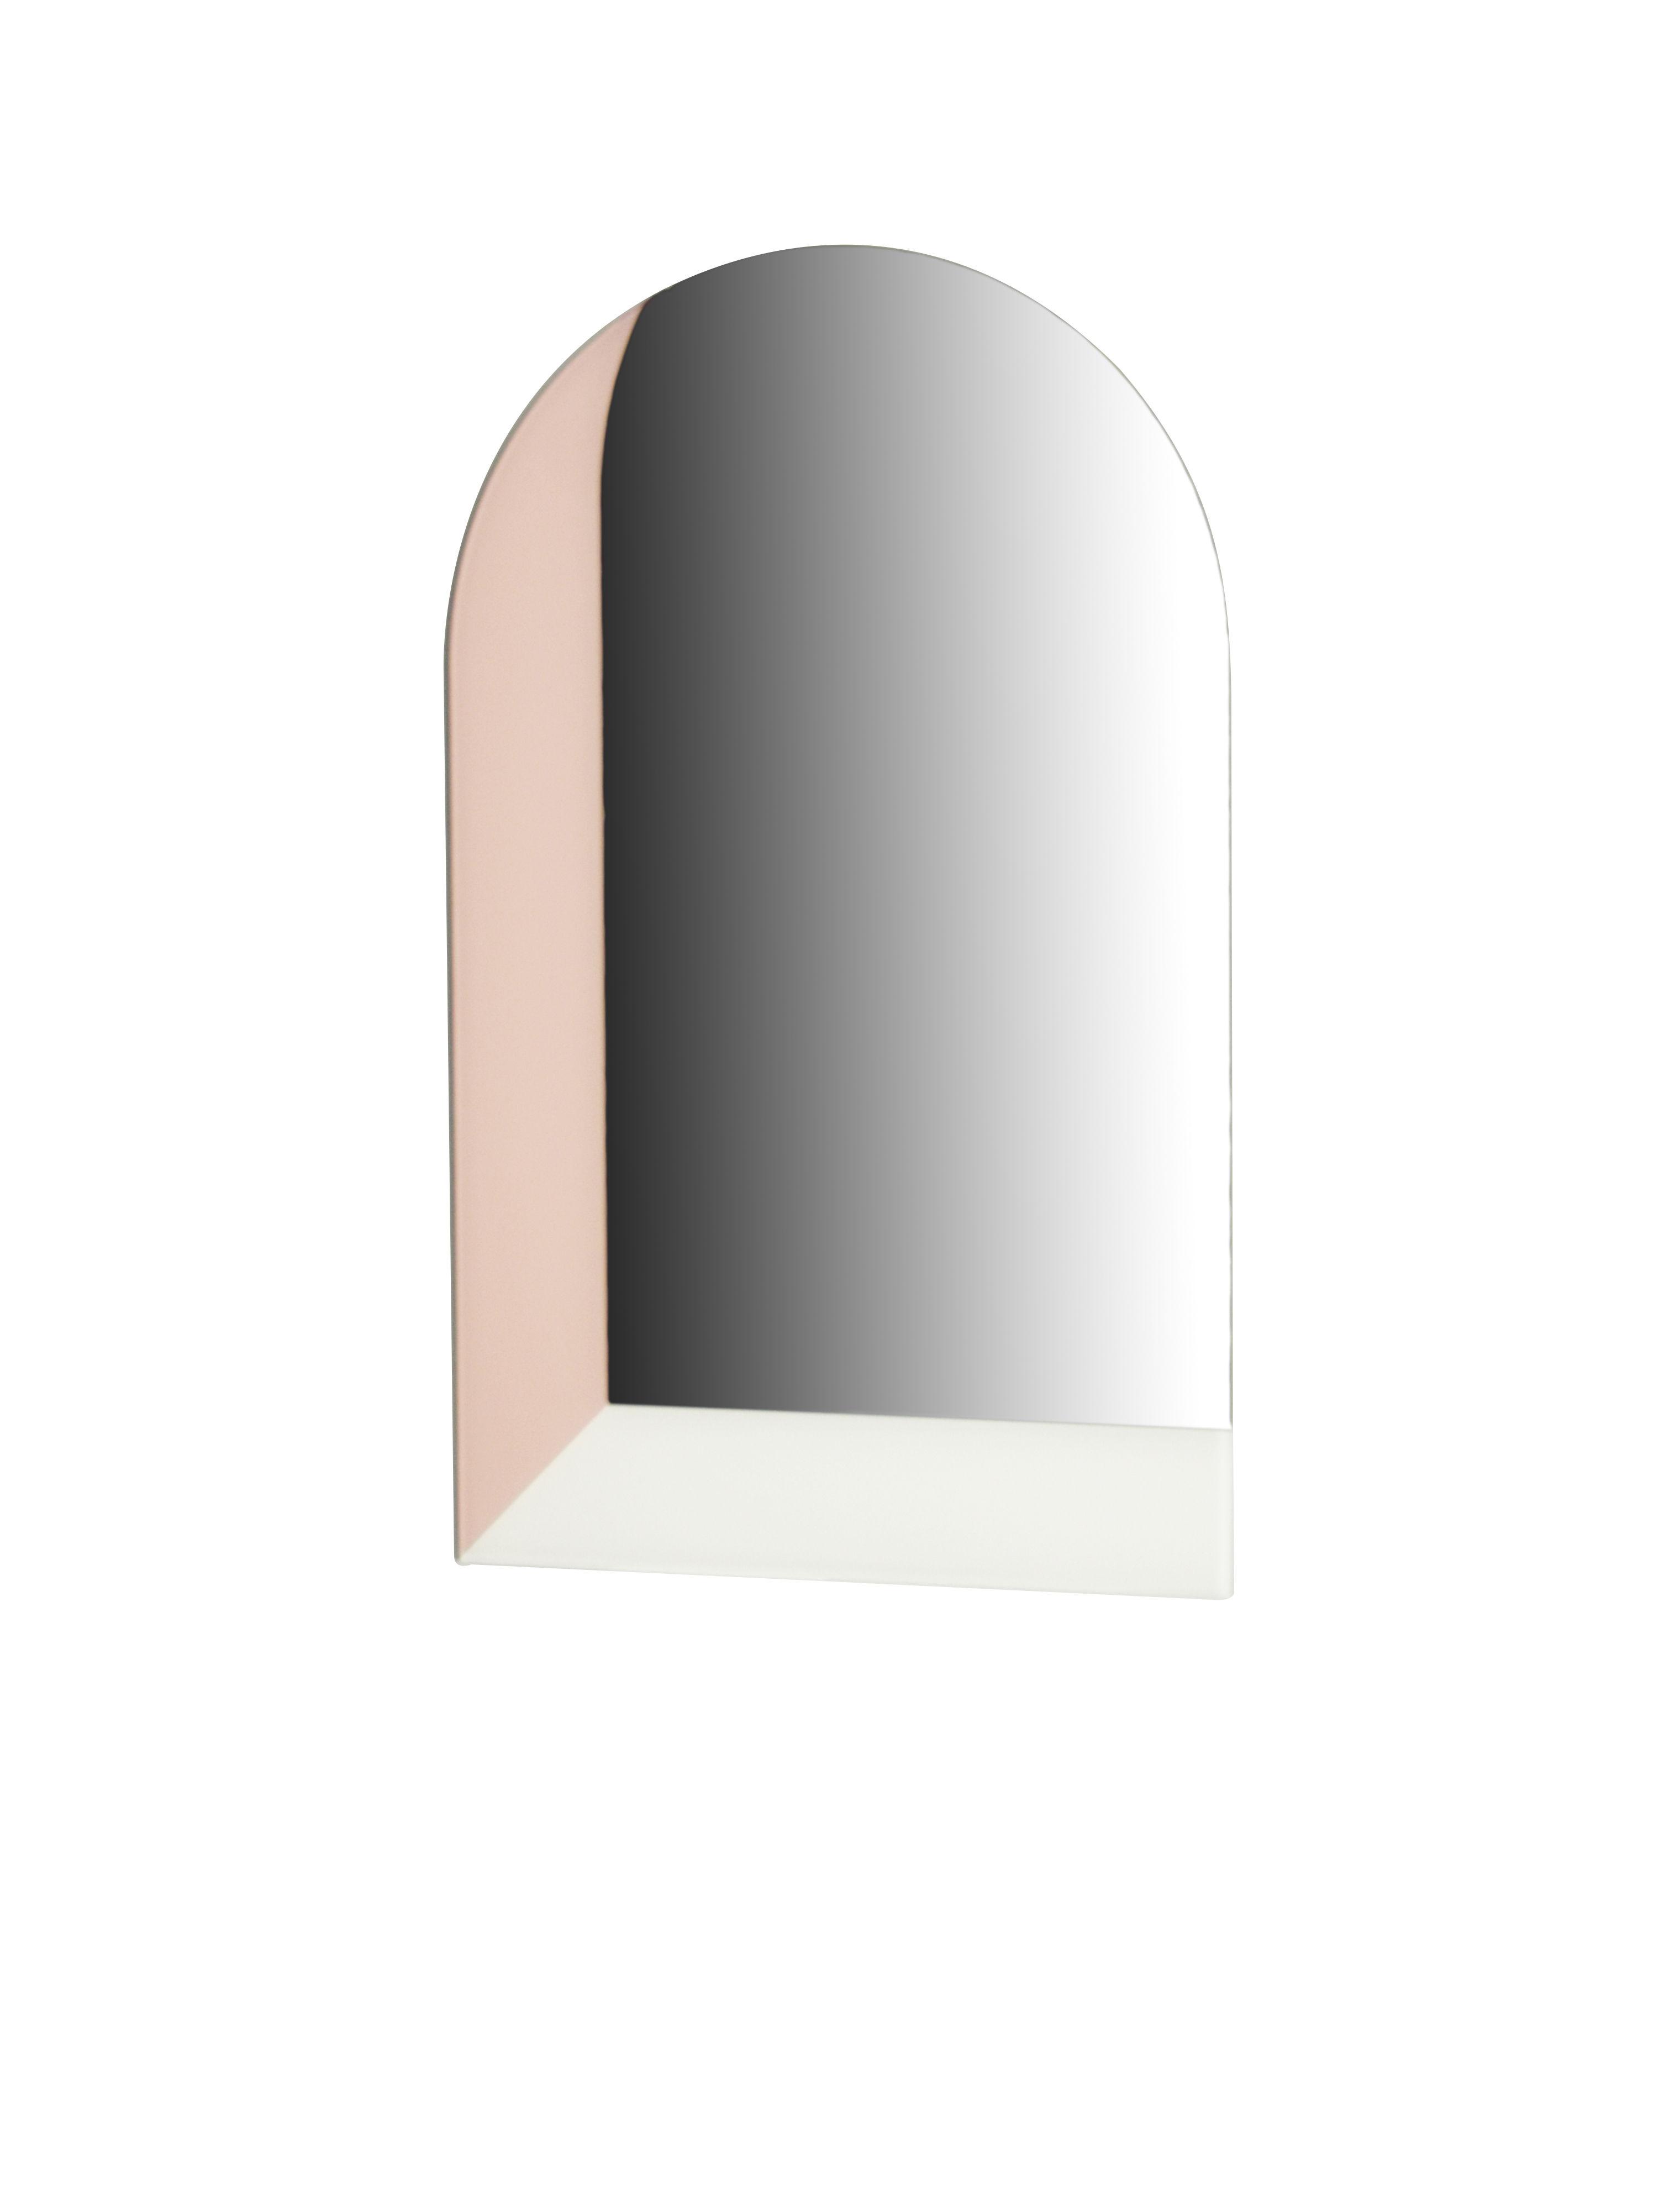 Déco - Miroirs - Miroir mural Linna Medium / H 70 cm - ENOstudio - Rose & ivoire - Miroir